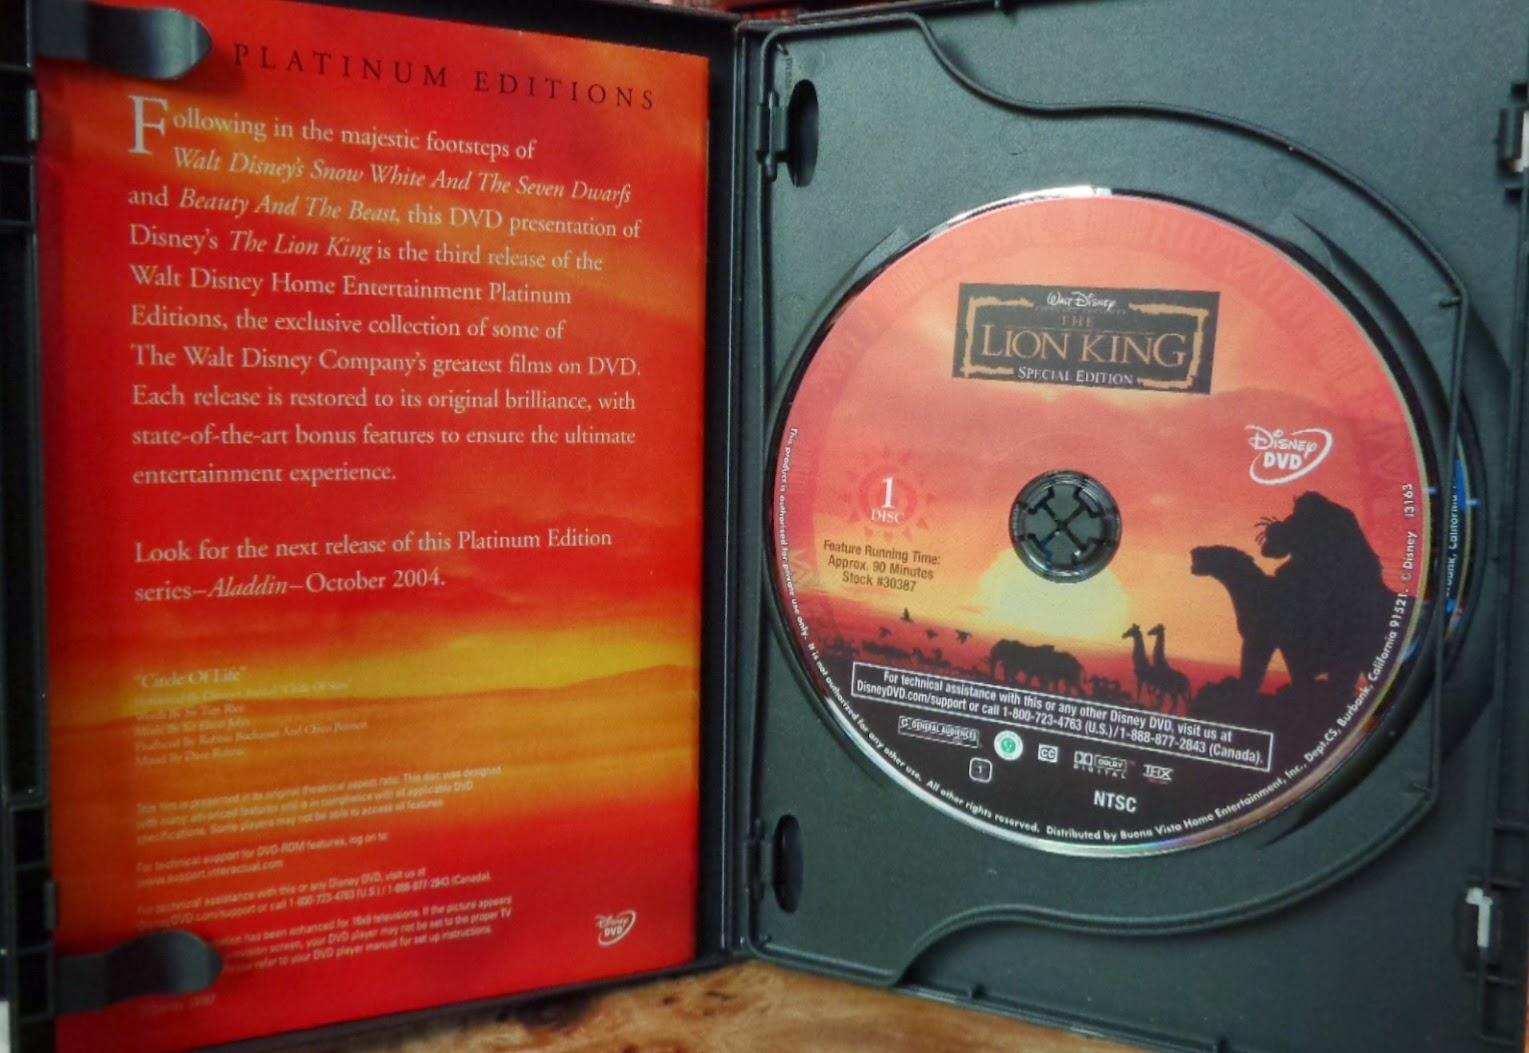 Lion king platinum edition dvd